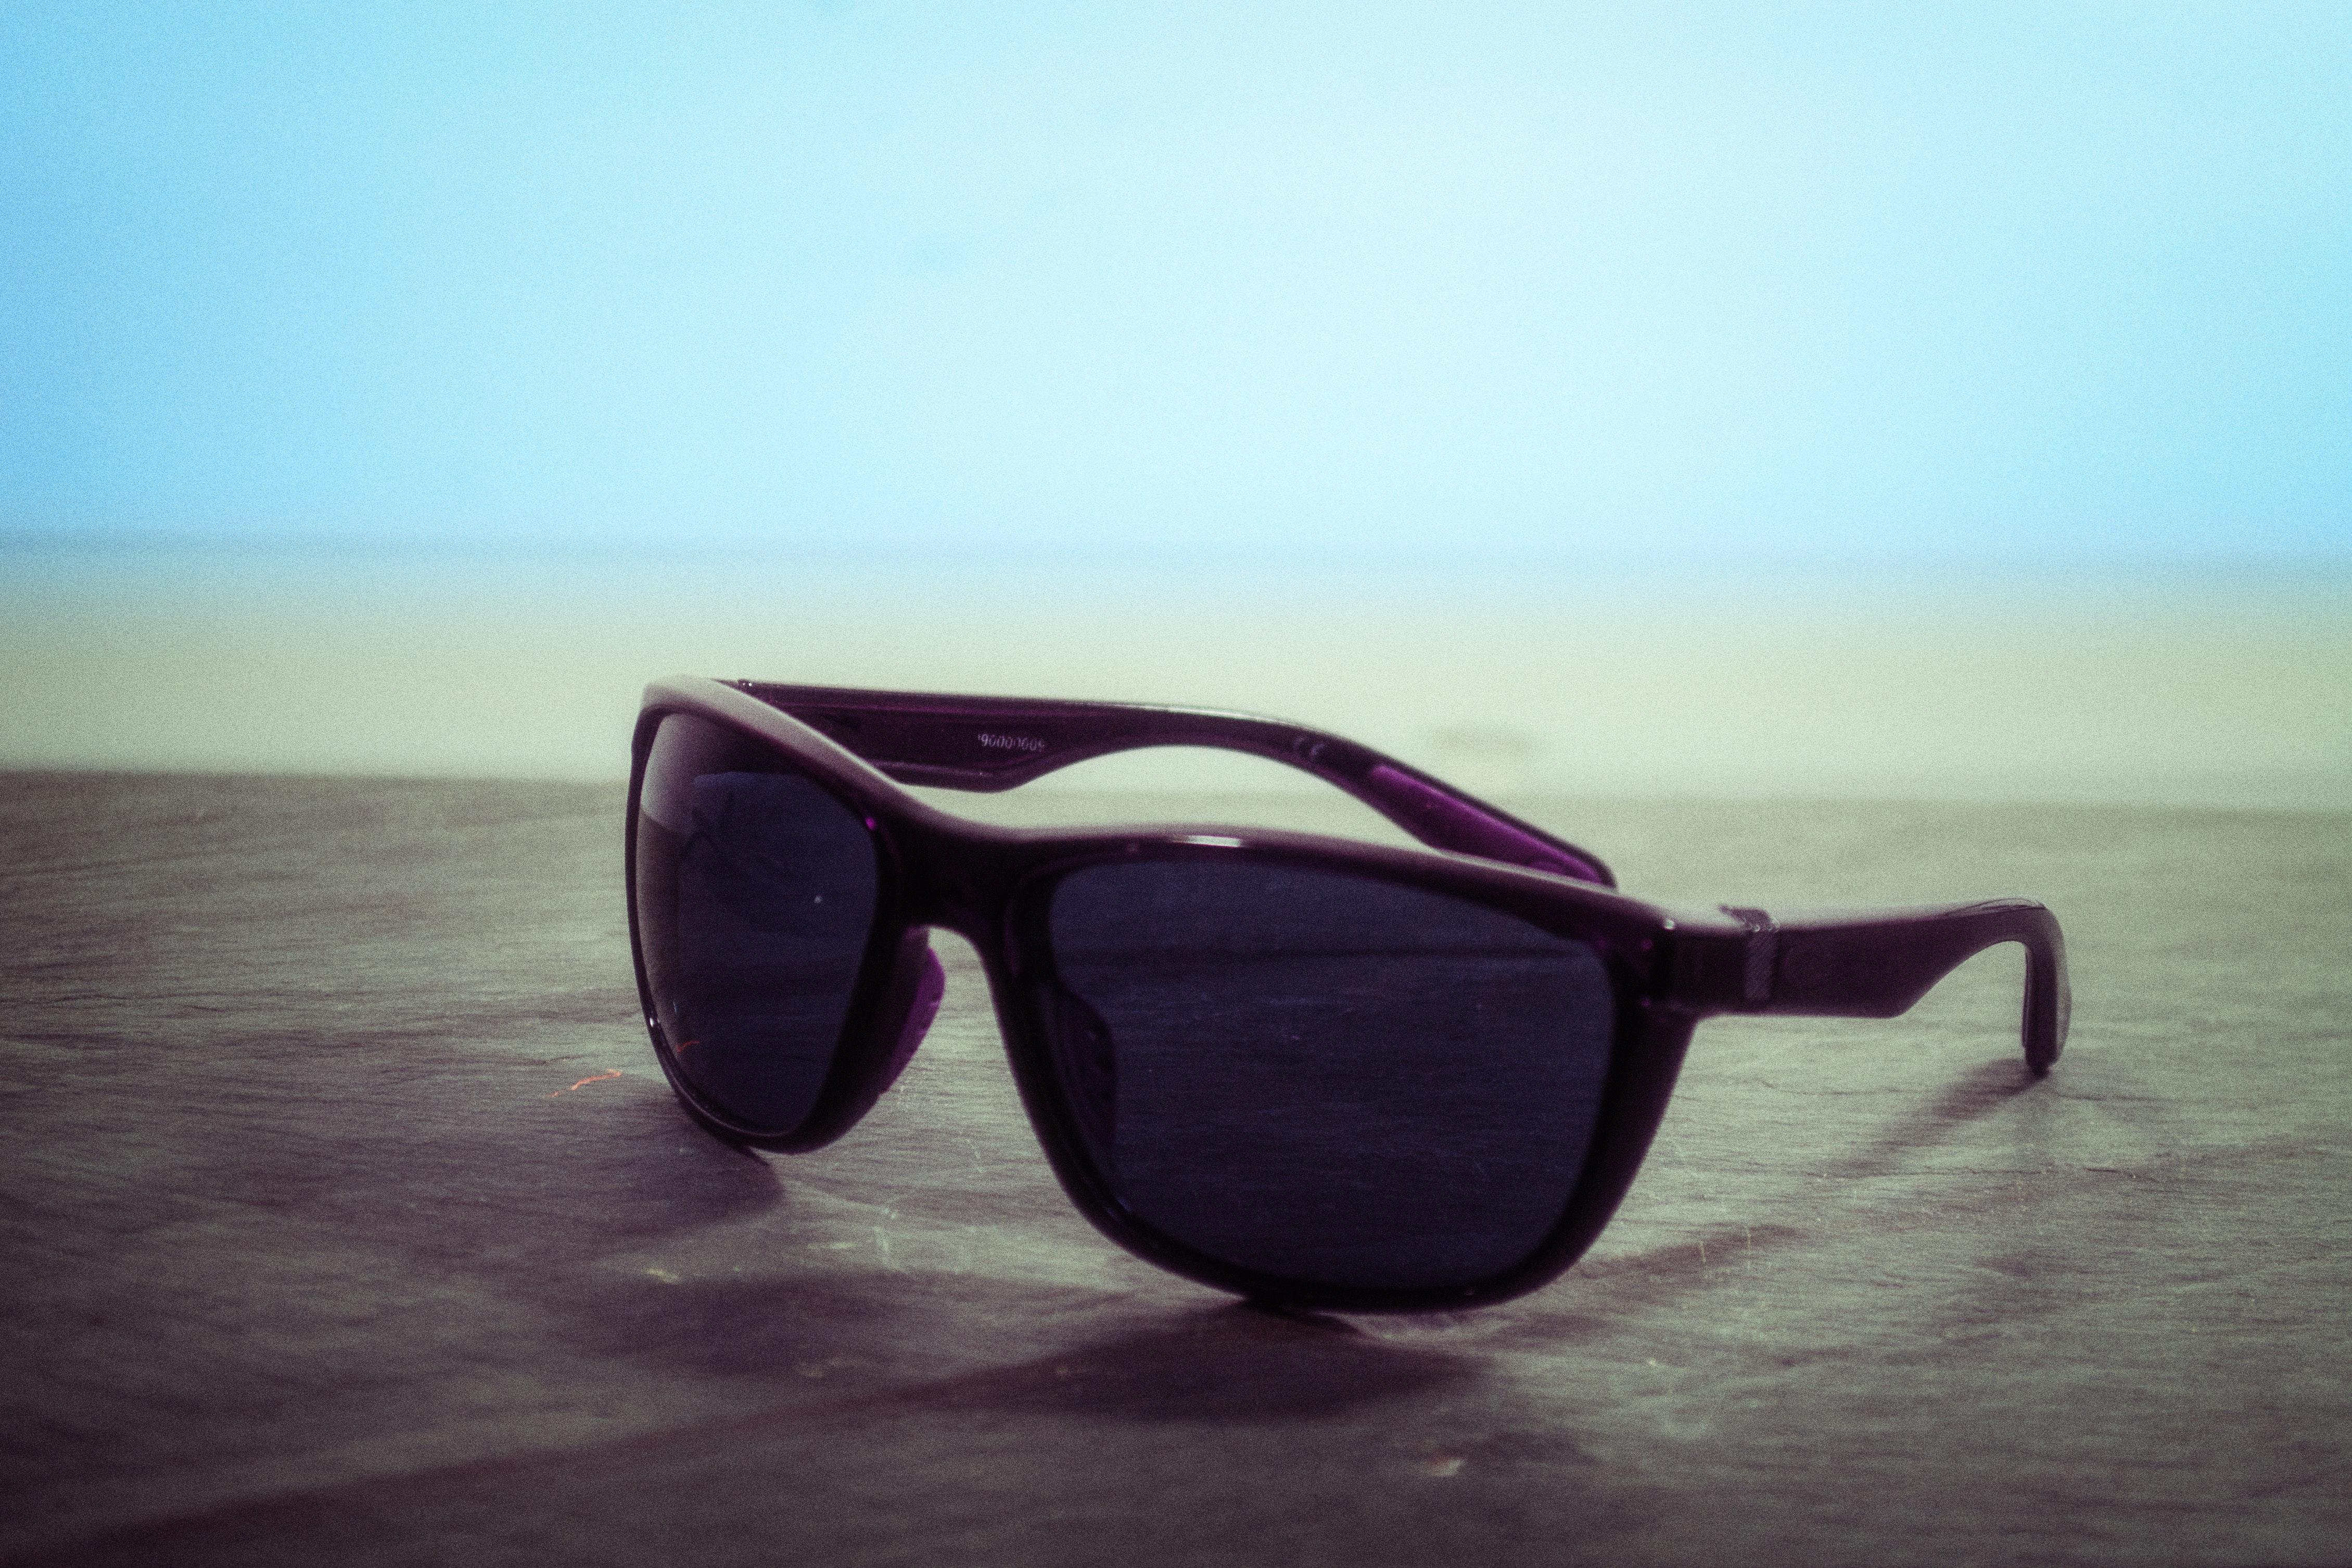 Black Wayfarer Sunglasses, Accessory, Black, Eyewear, Fashion, HQ Photo